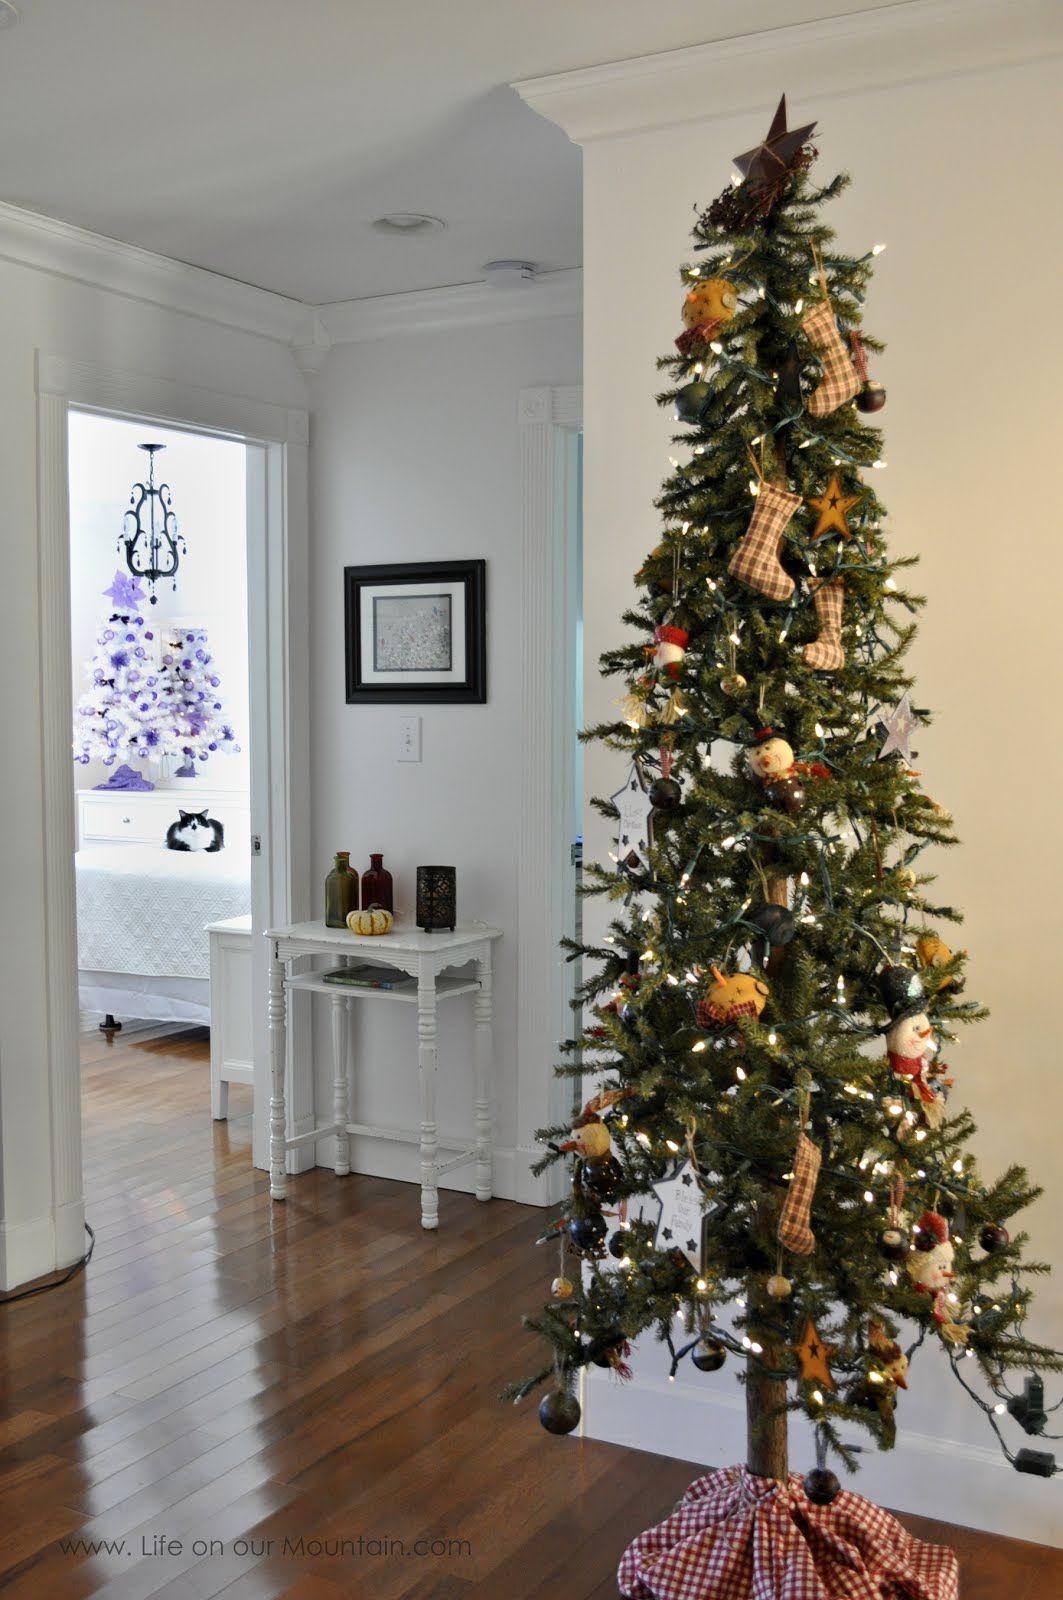 Skinny Primitive Christmas Tree With Handmade Ornaments Takes Up Virtually No Space Skinny Christmas Tree Pencil Christmas Tree Country Christmas Trees